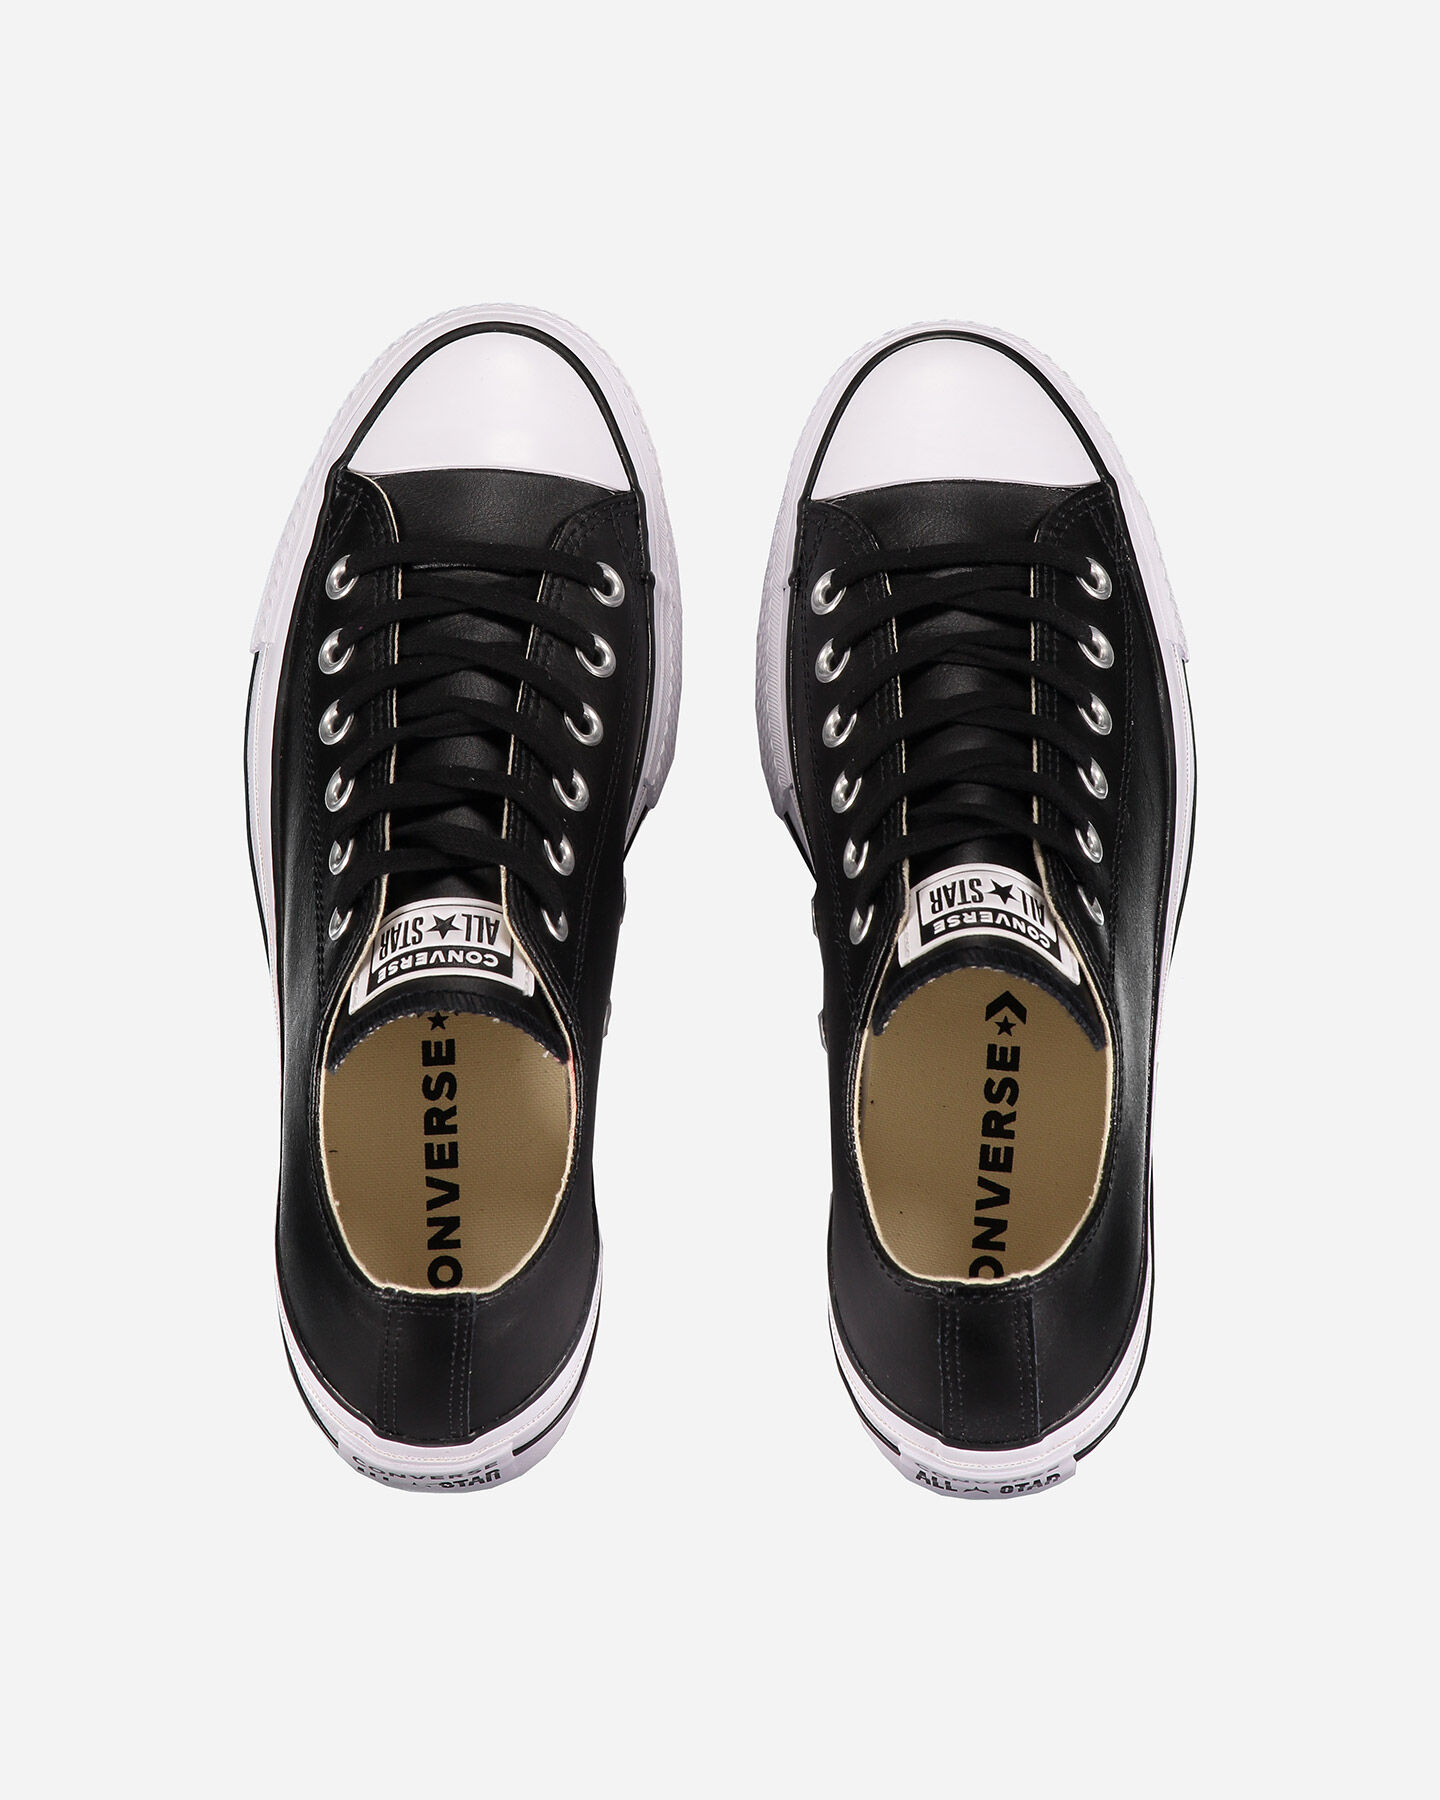 scarpe donna all star converse basse